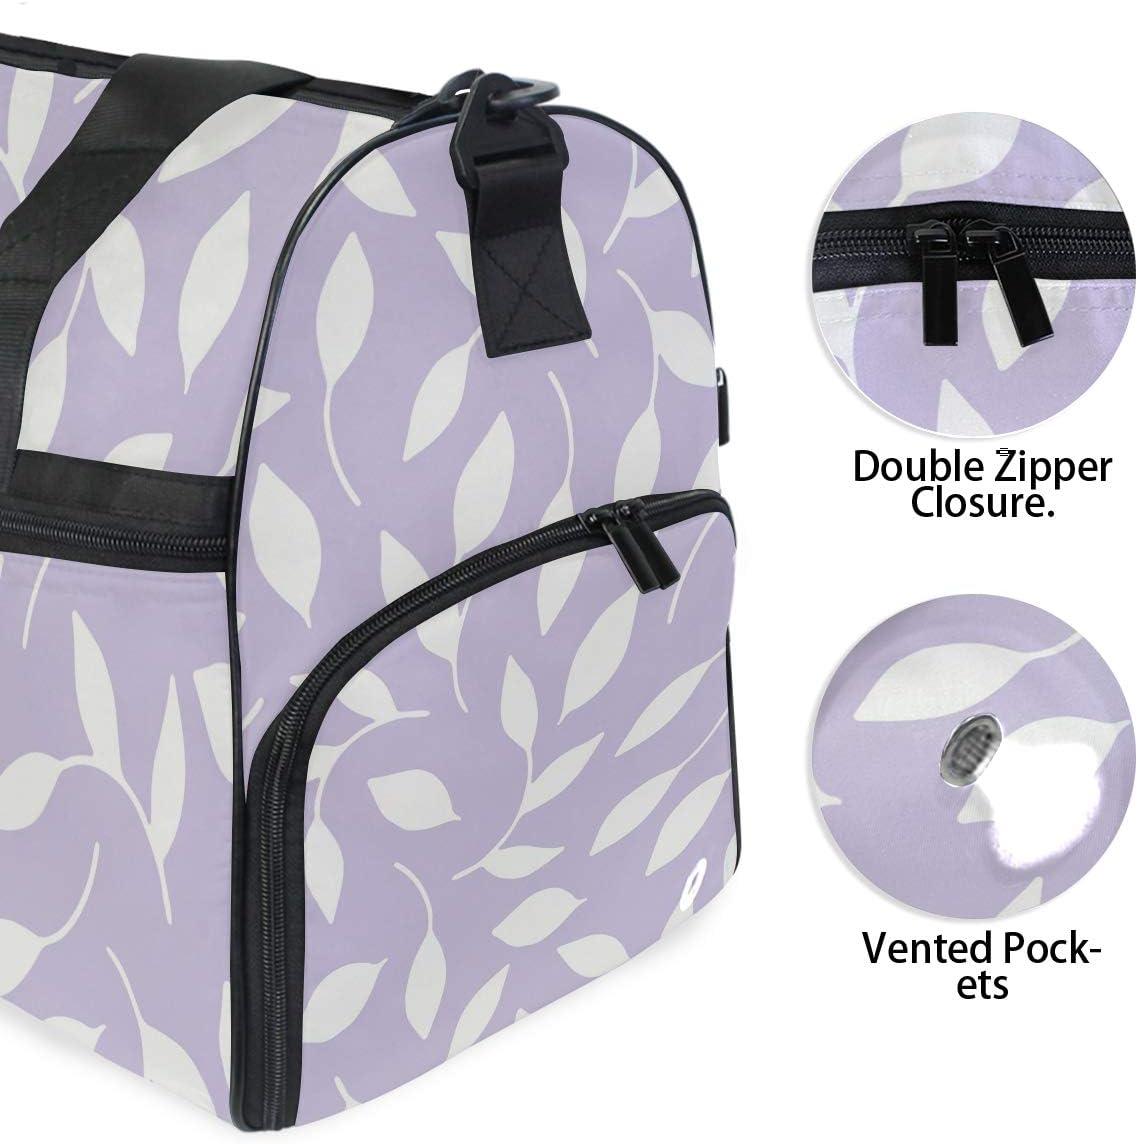 FAJRO Duffle Bag for Women Men Grass Travel Duffel Bag Large Size Water-proof Tear Resistant